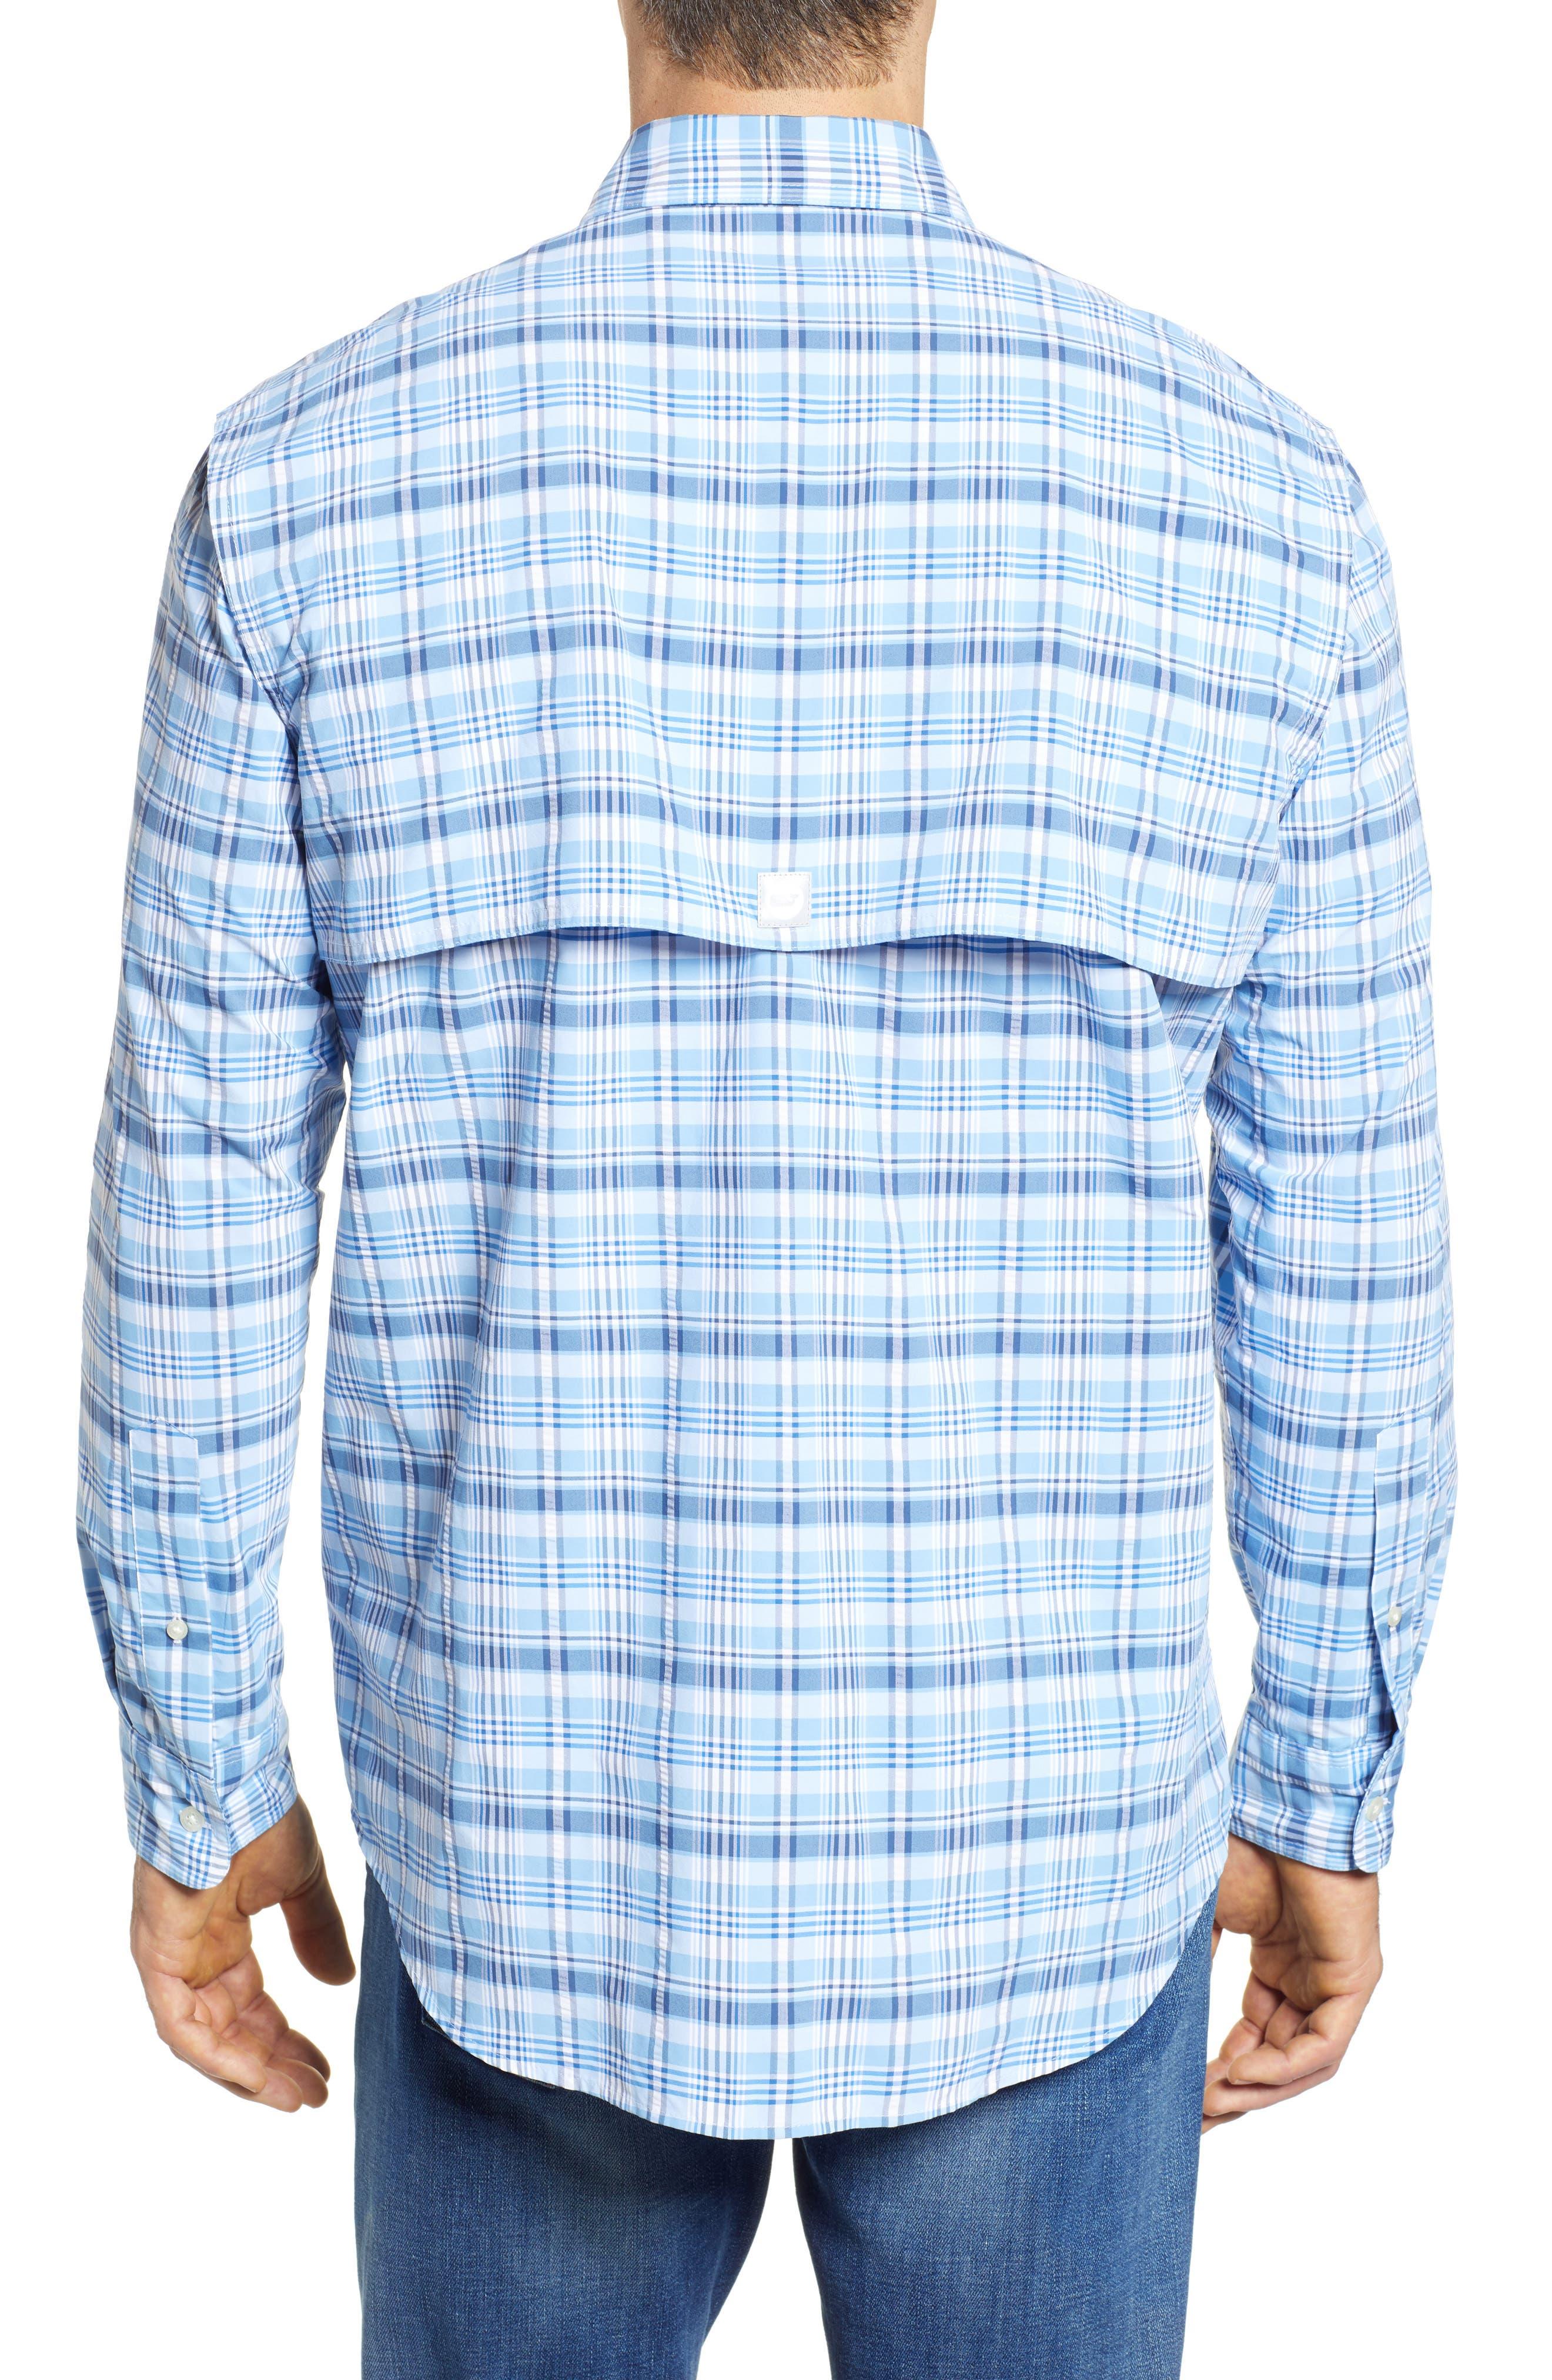 Prospect Hill Harbor Regular Fit Plaid Performance Sport Shirt,                             Alternate thumbnail 3, color,                             Ocean Breeze